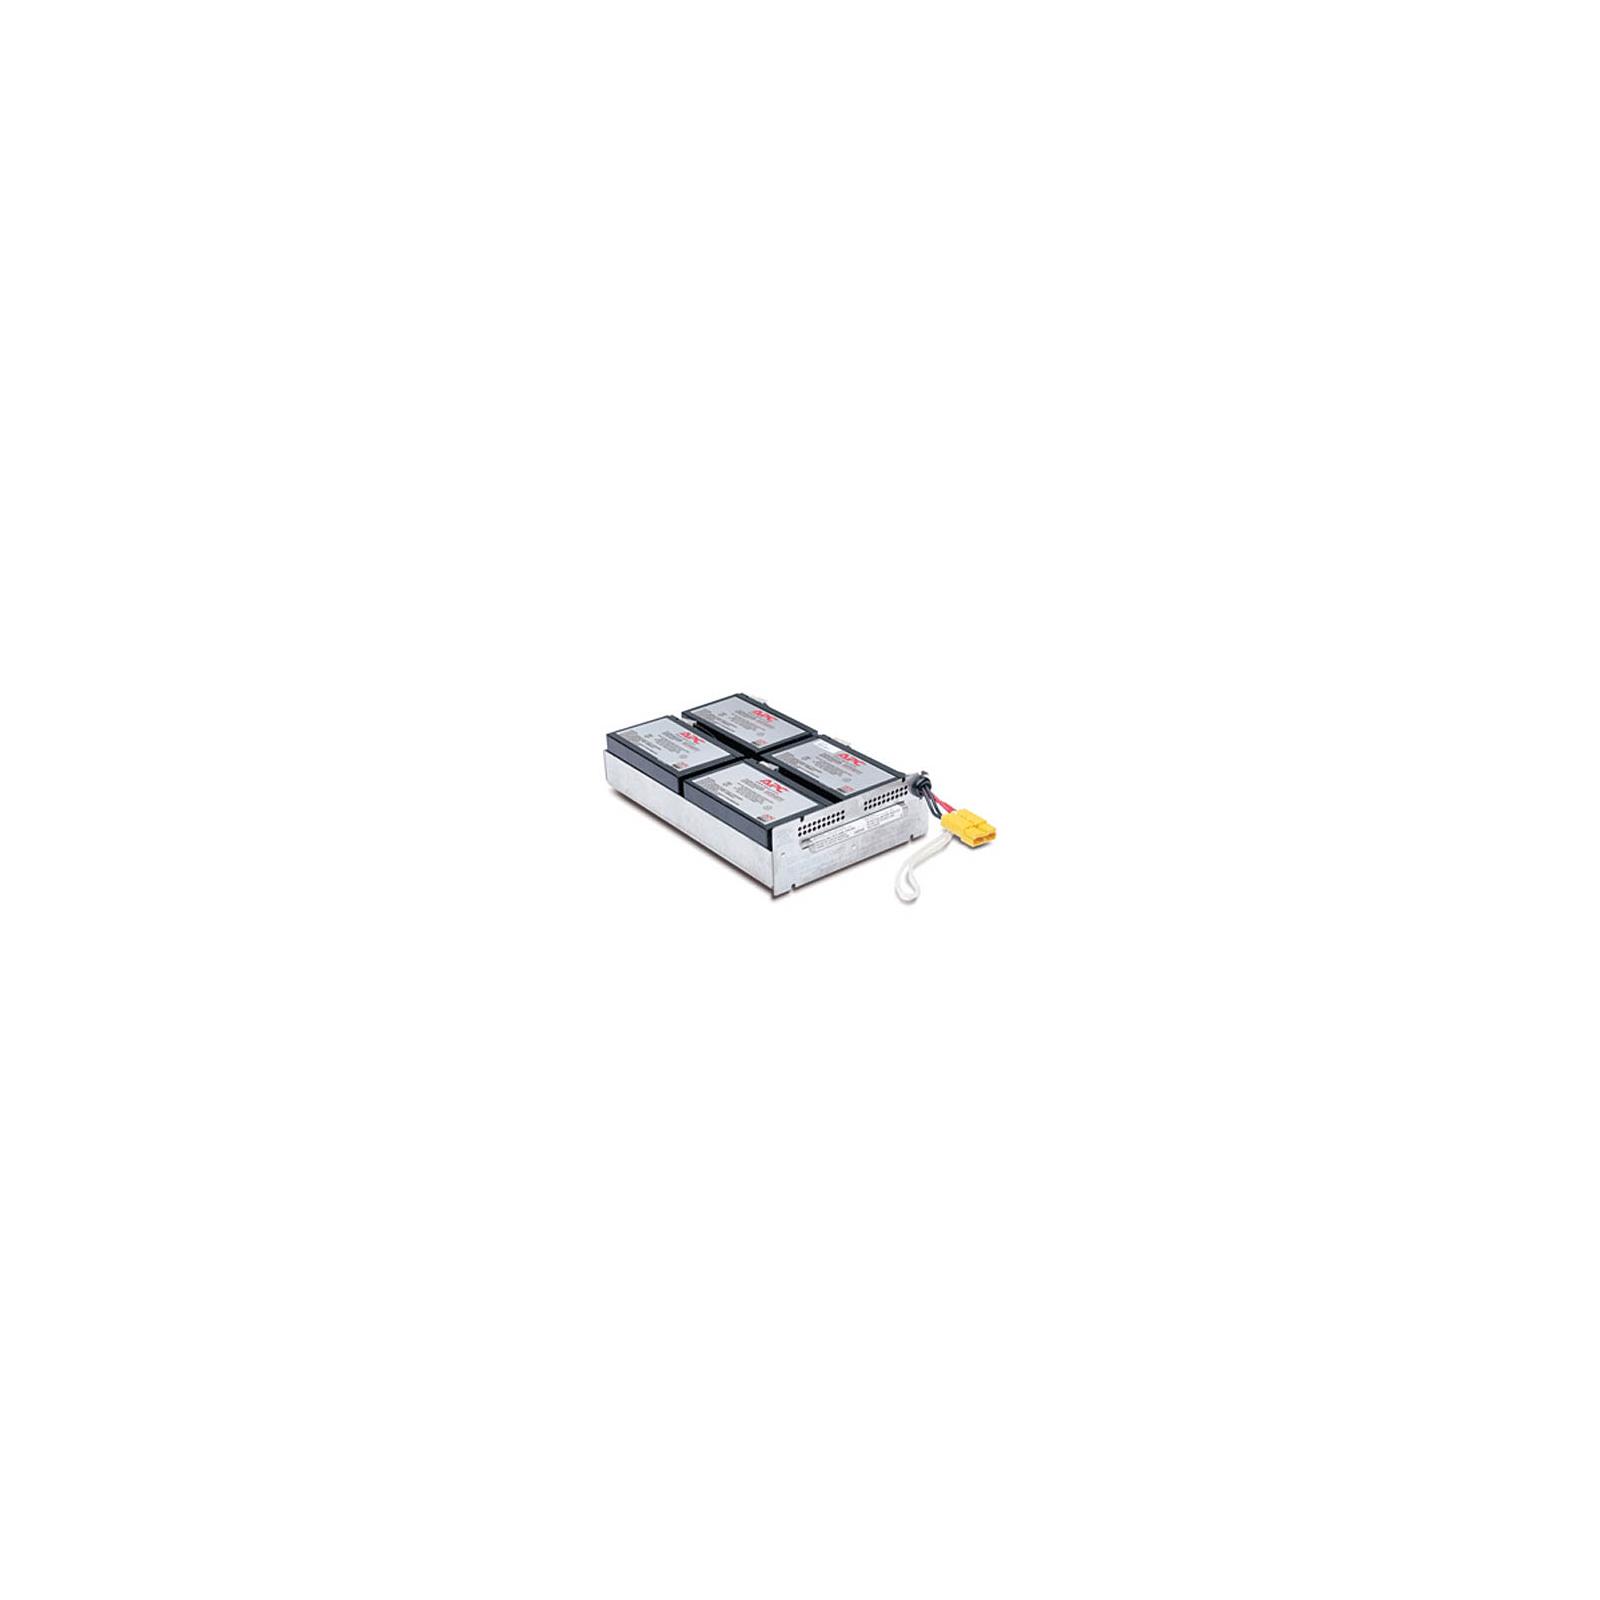 Батарея к ИБП Replacement Battery Cartridge #24 APC (RBC24)